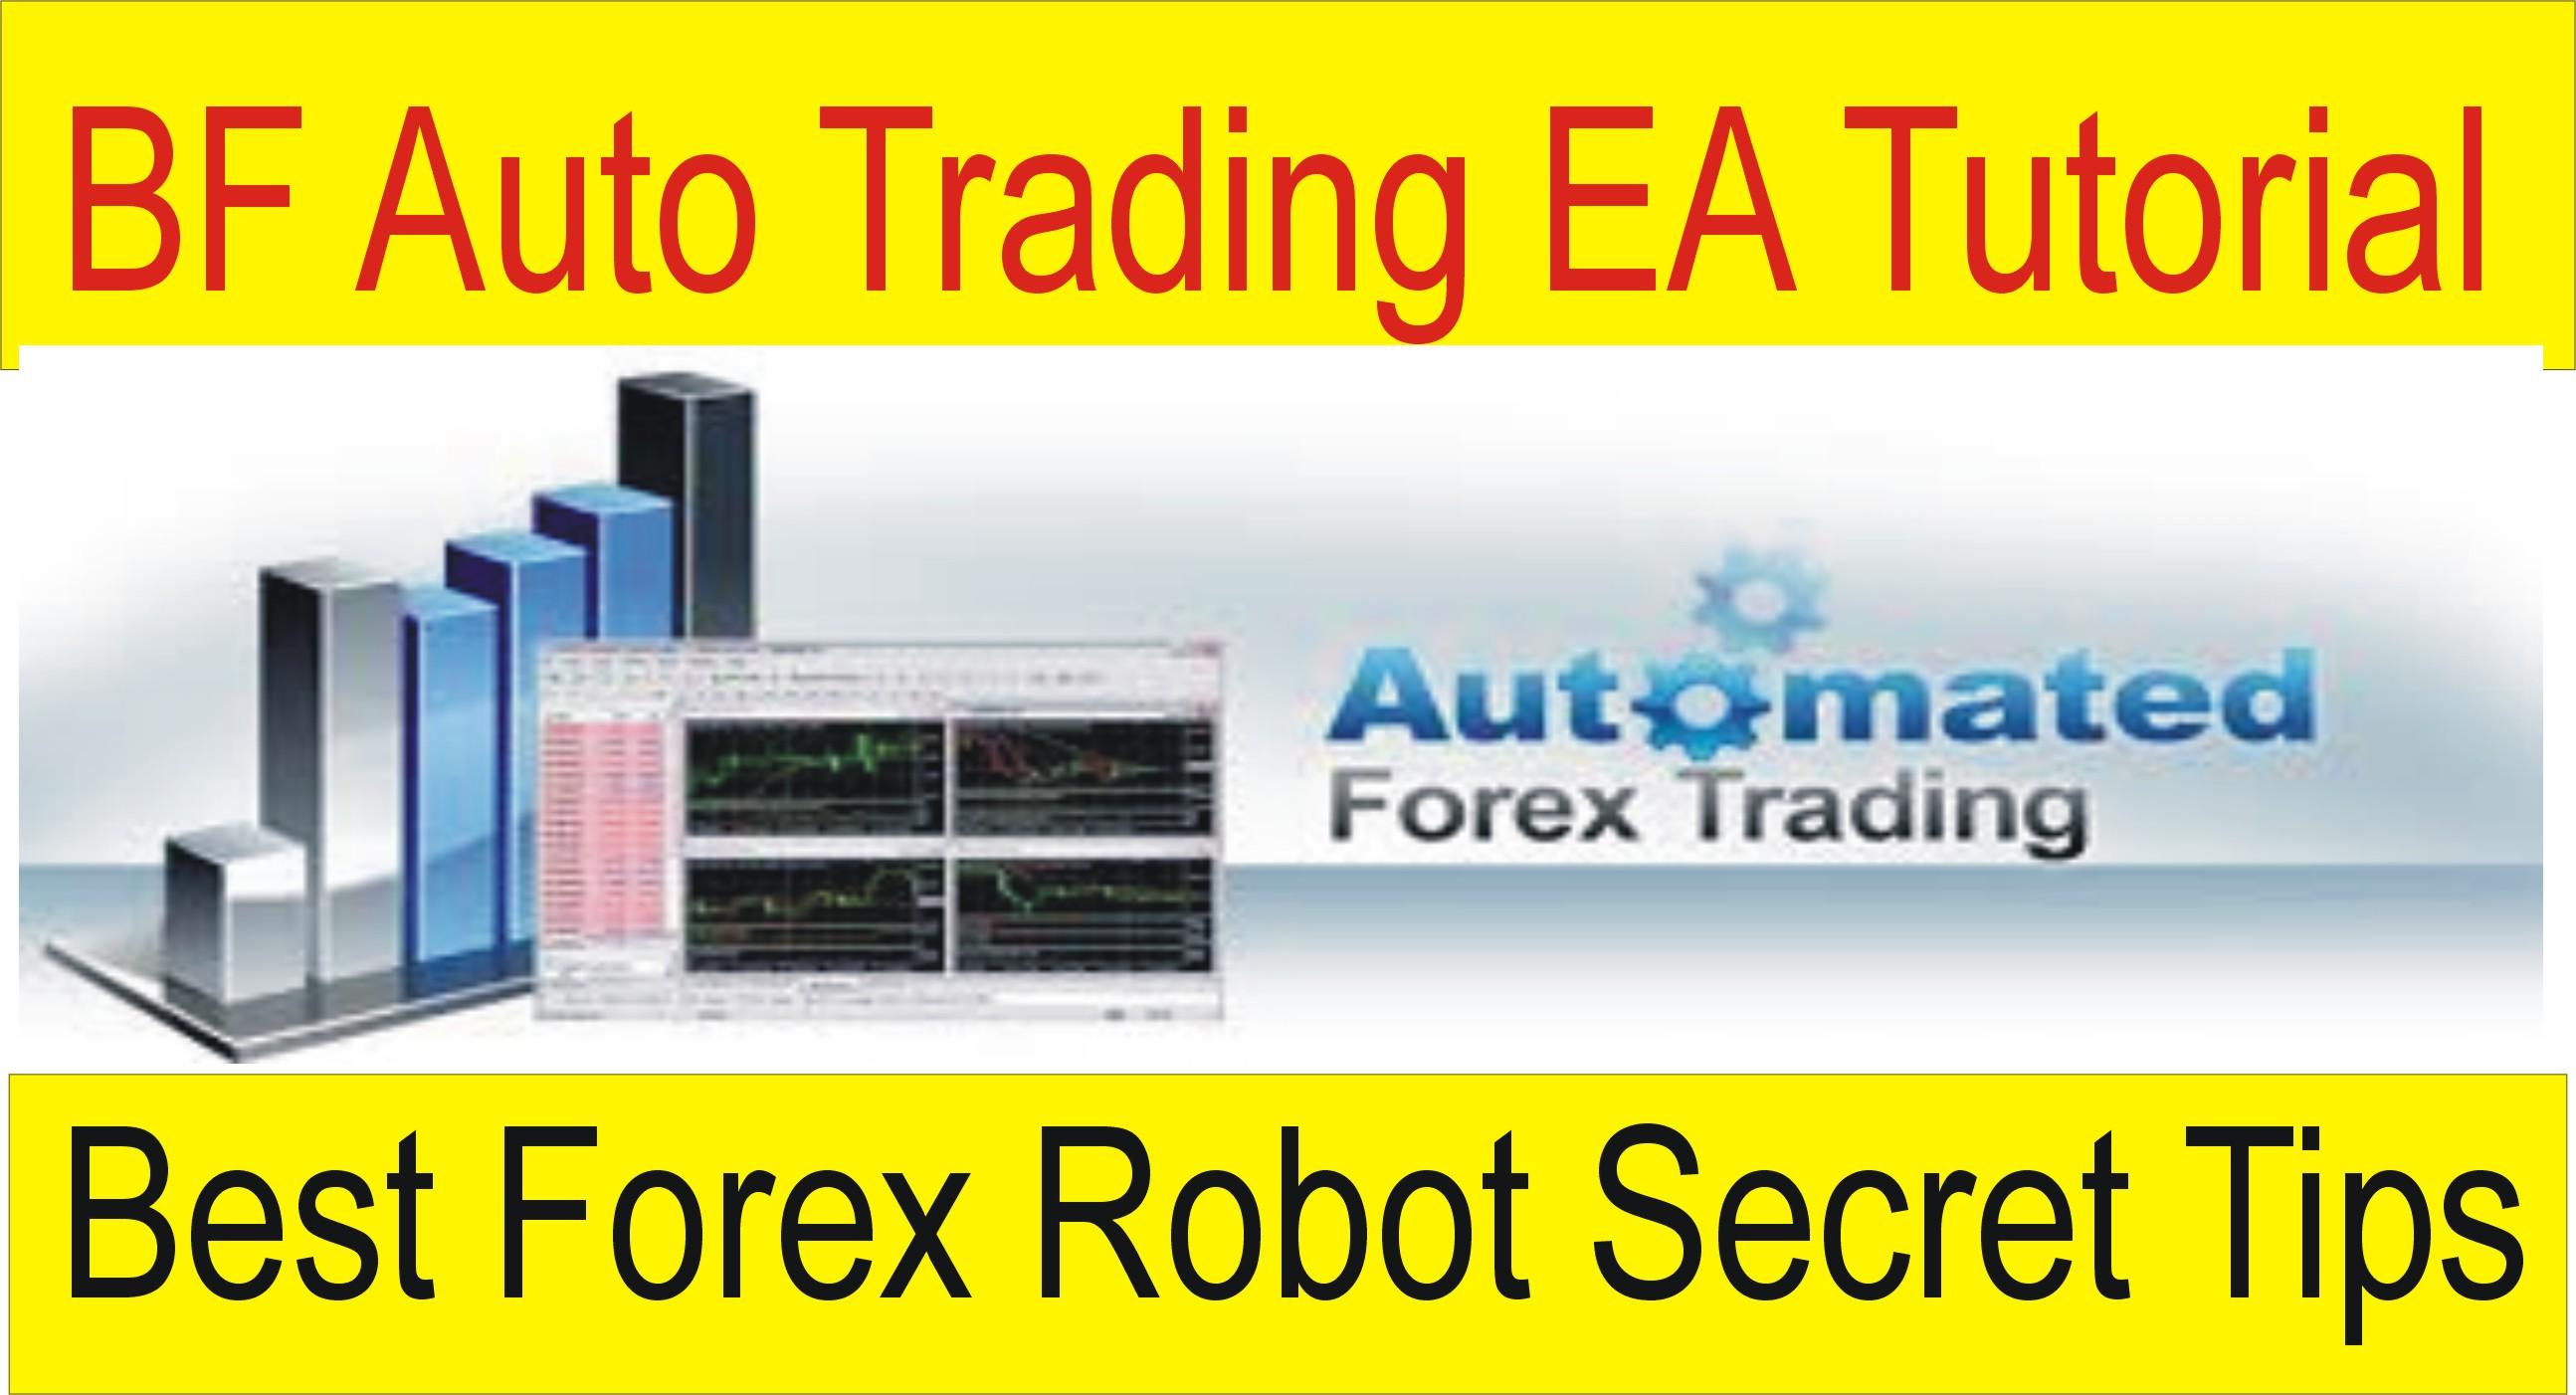 Best Forex Trading Robot 2019 | BF EA Secret Tips by TaniForex